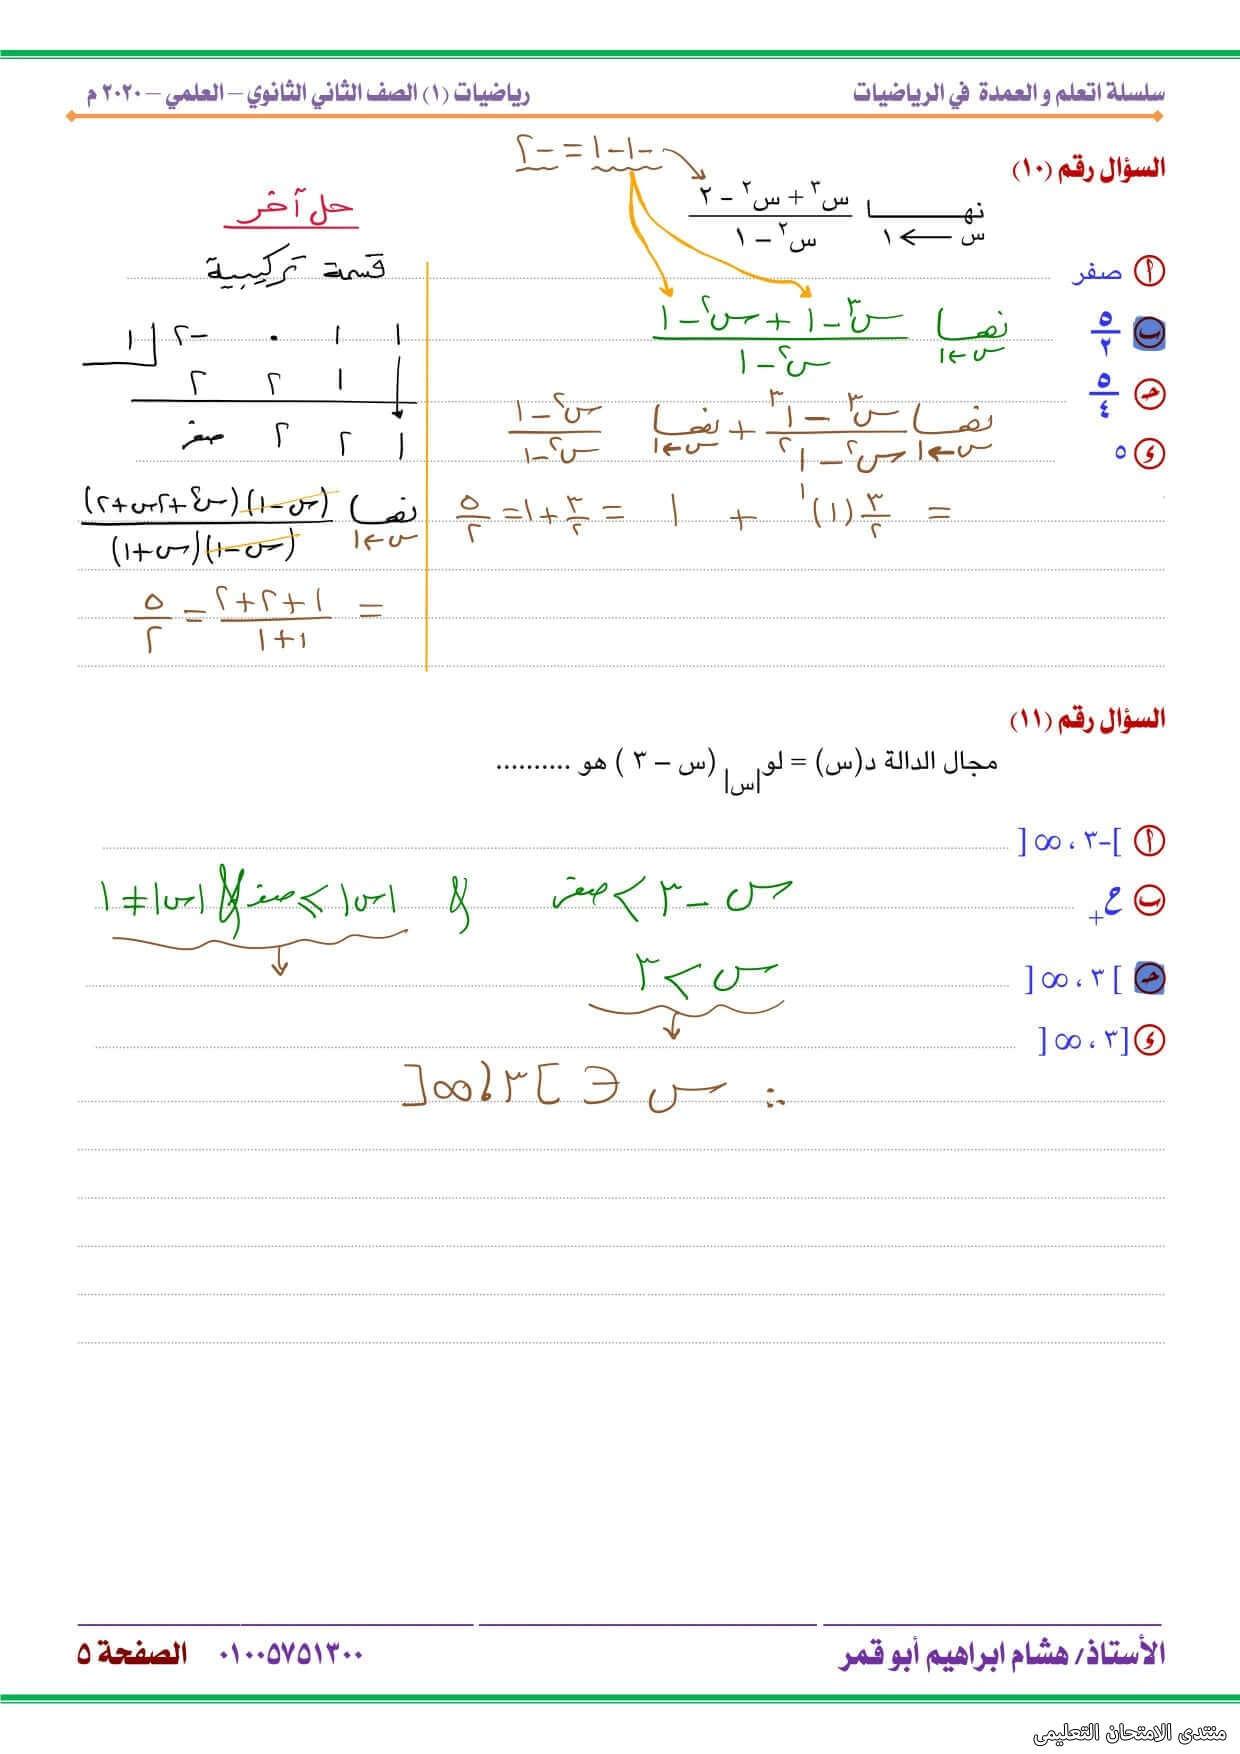 exam-eg.com_161444094926144.jpg